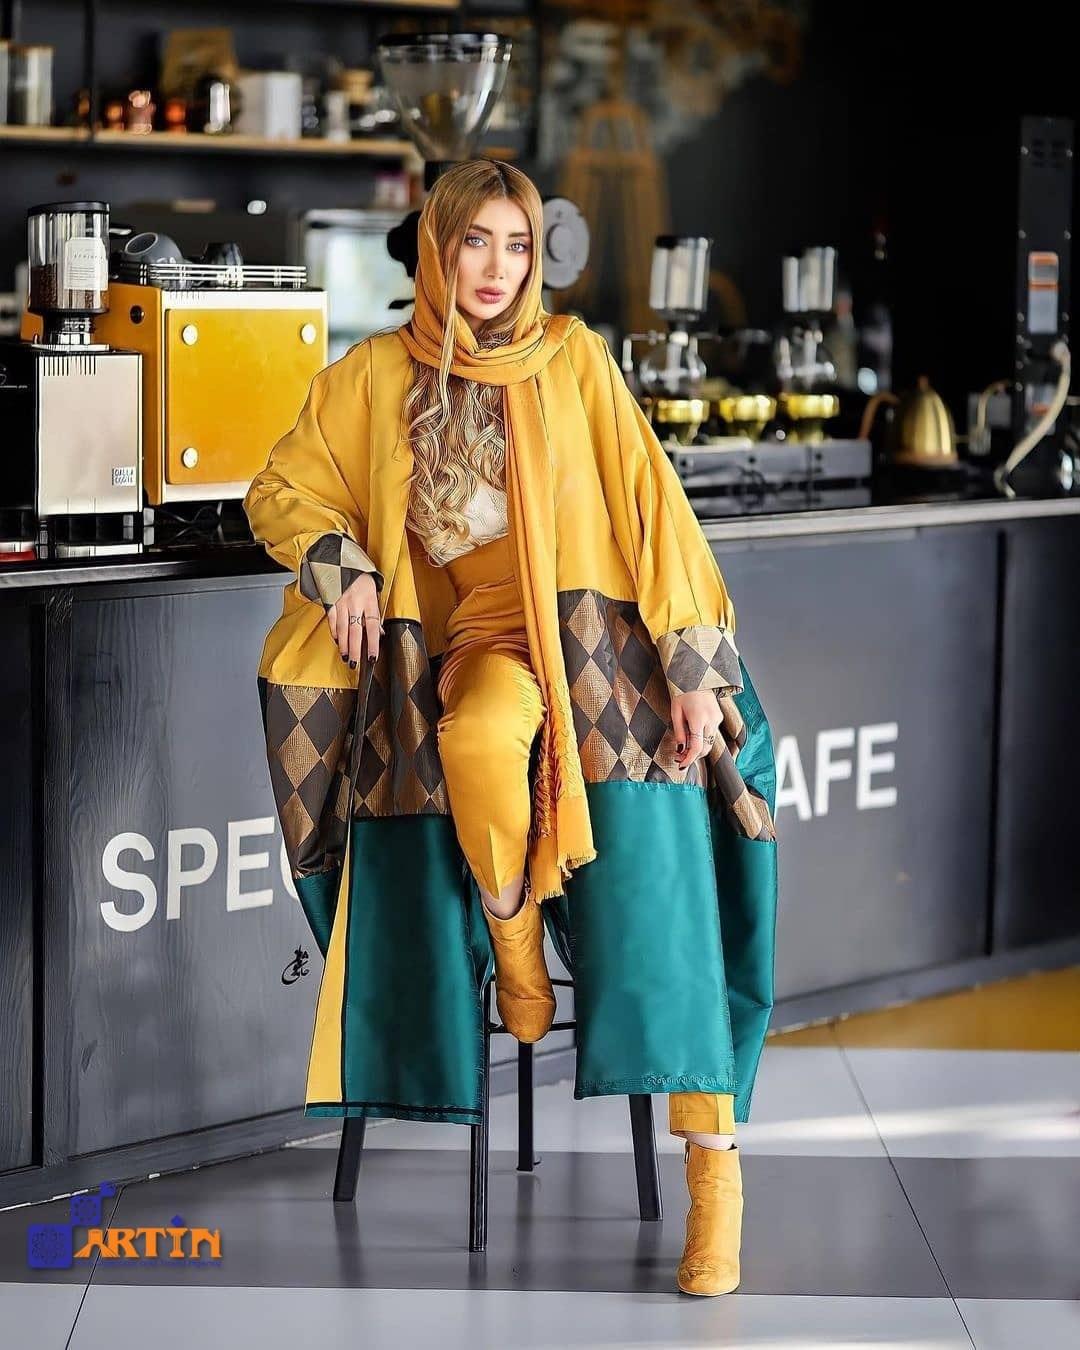 Iranian women street fashion in Tehran